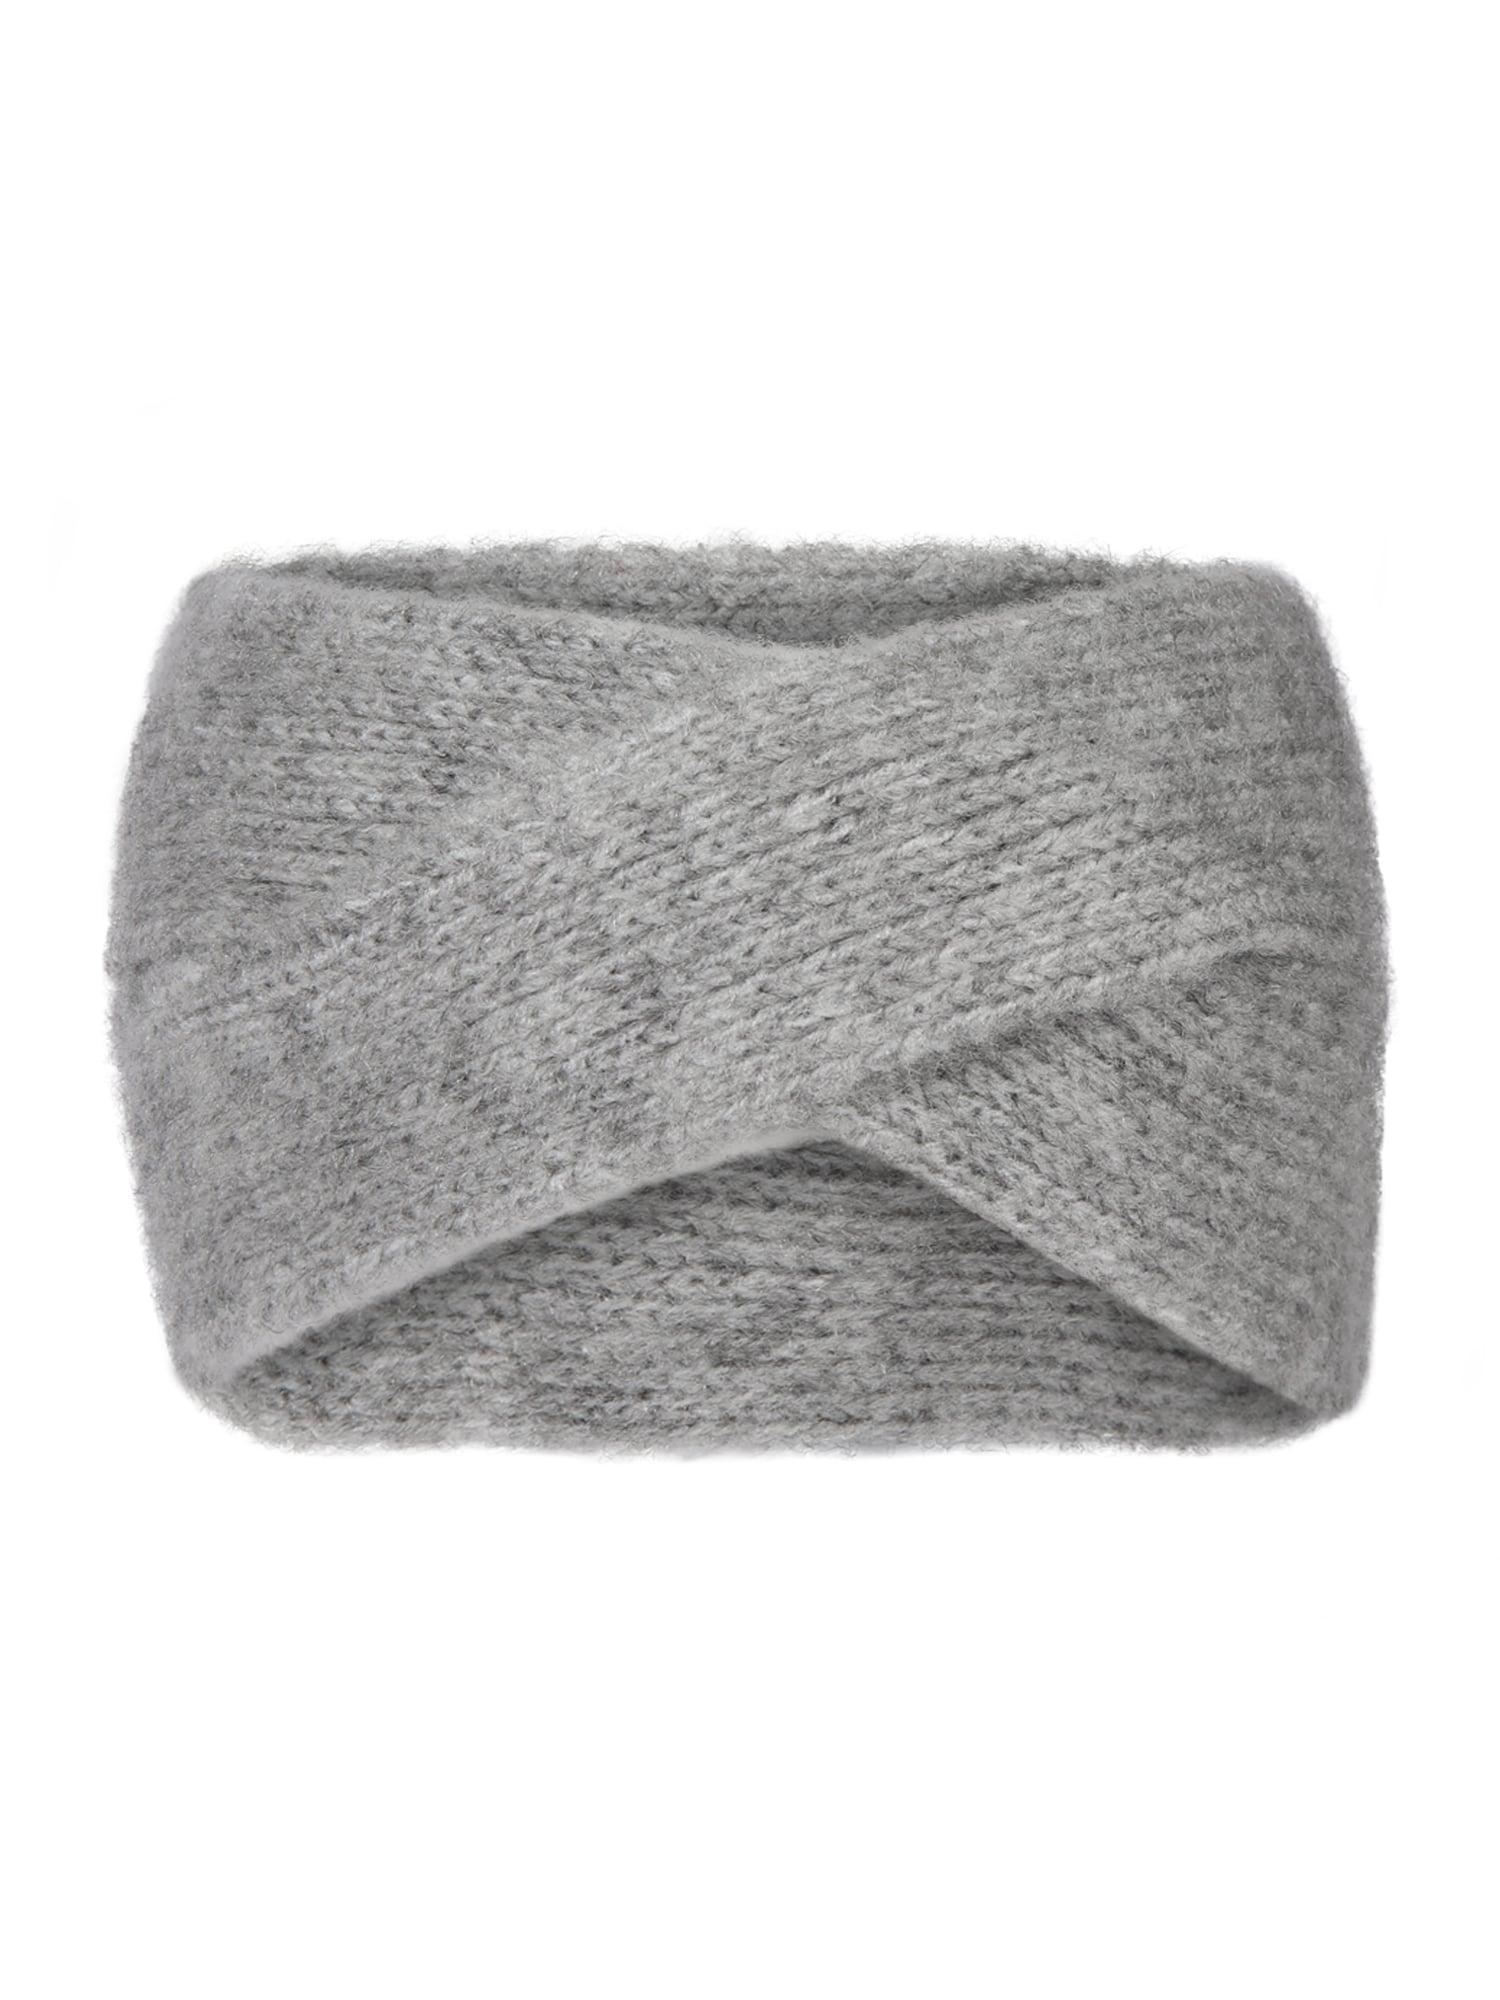 Čelenka Marcellina Headband šedá NÜMPH